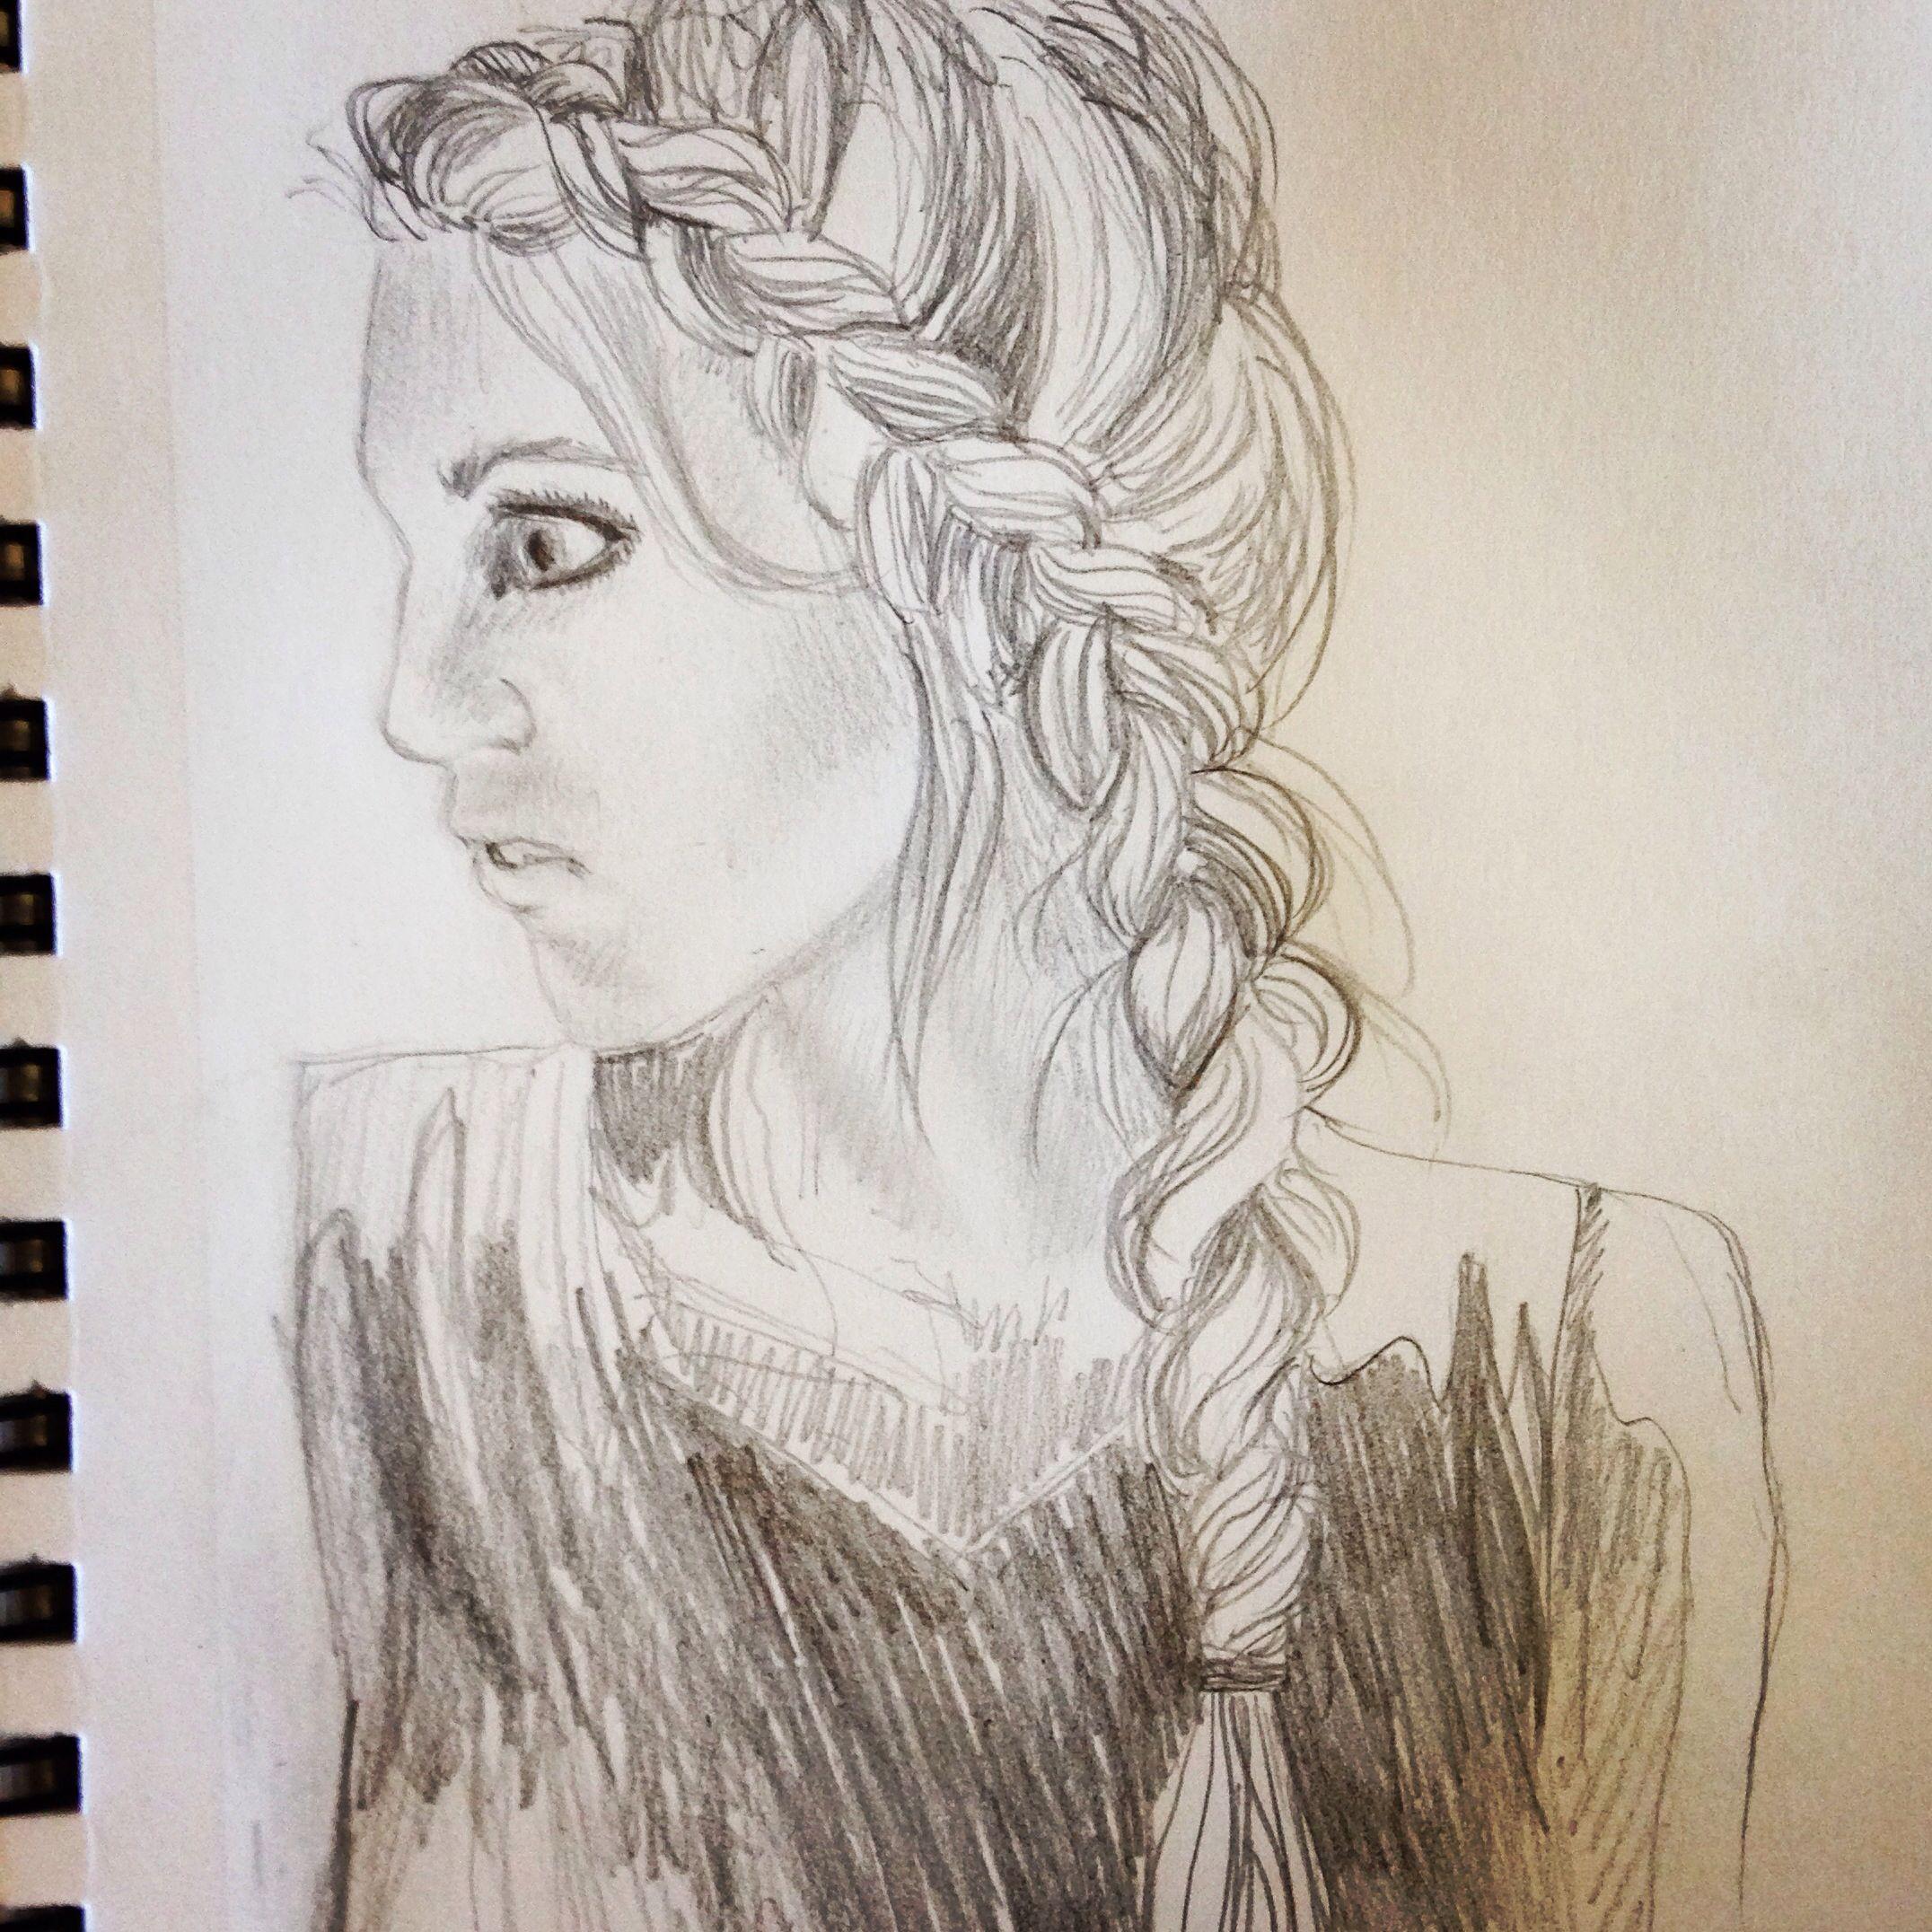 Had the urge to sketch a braid :)